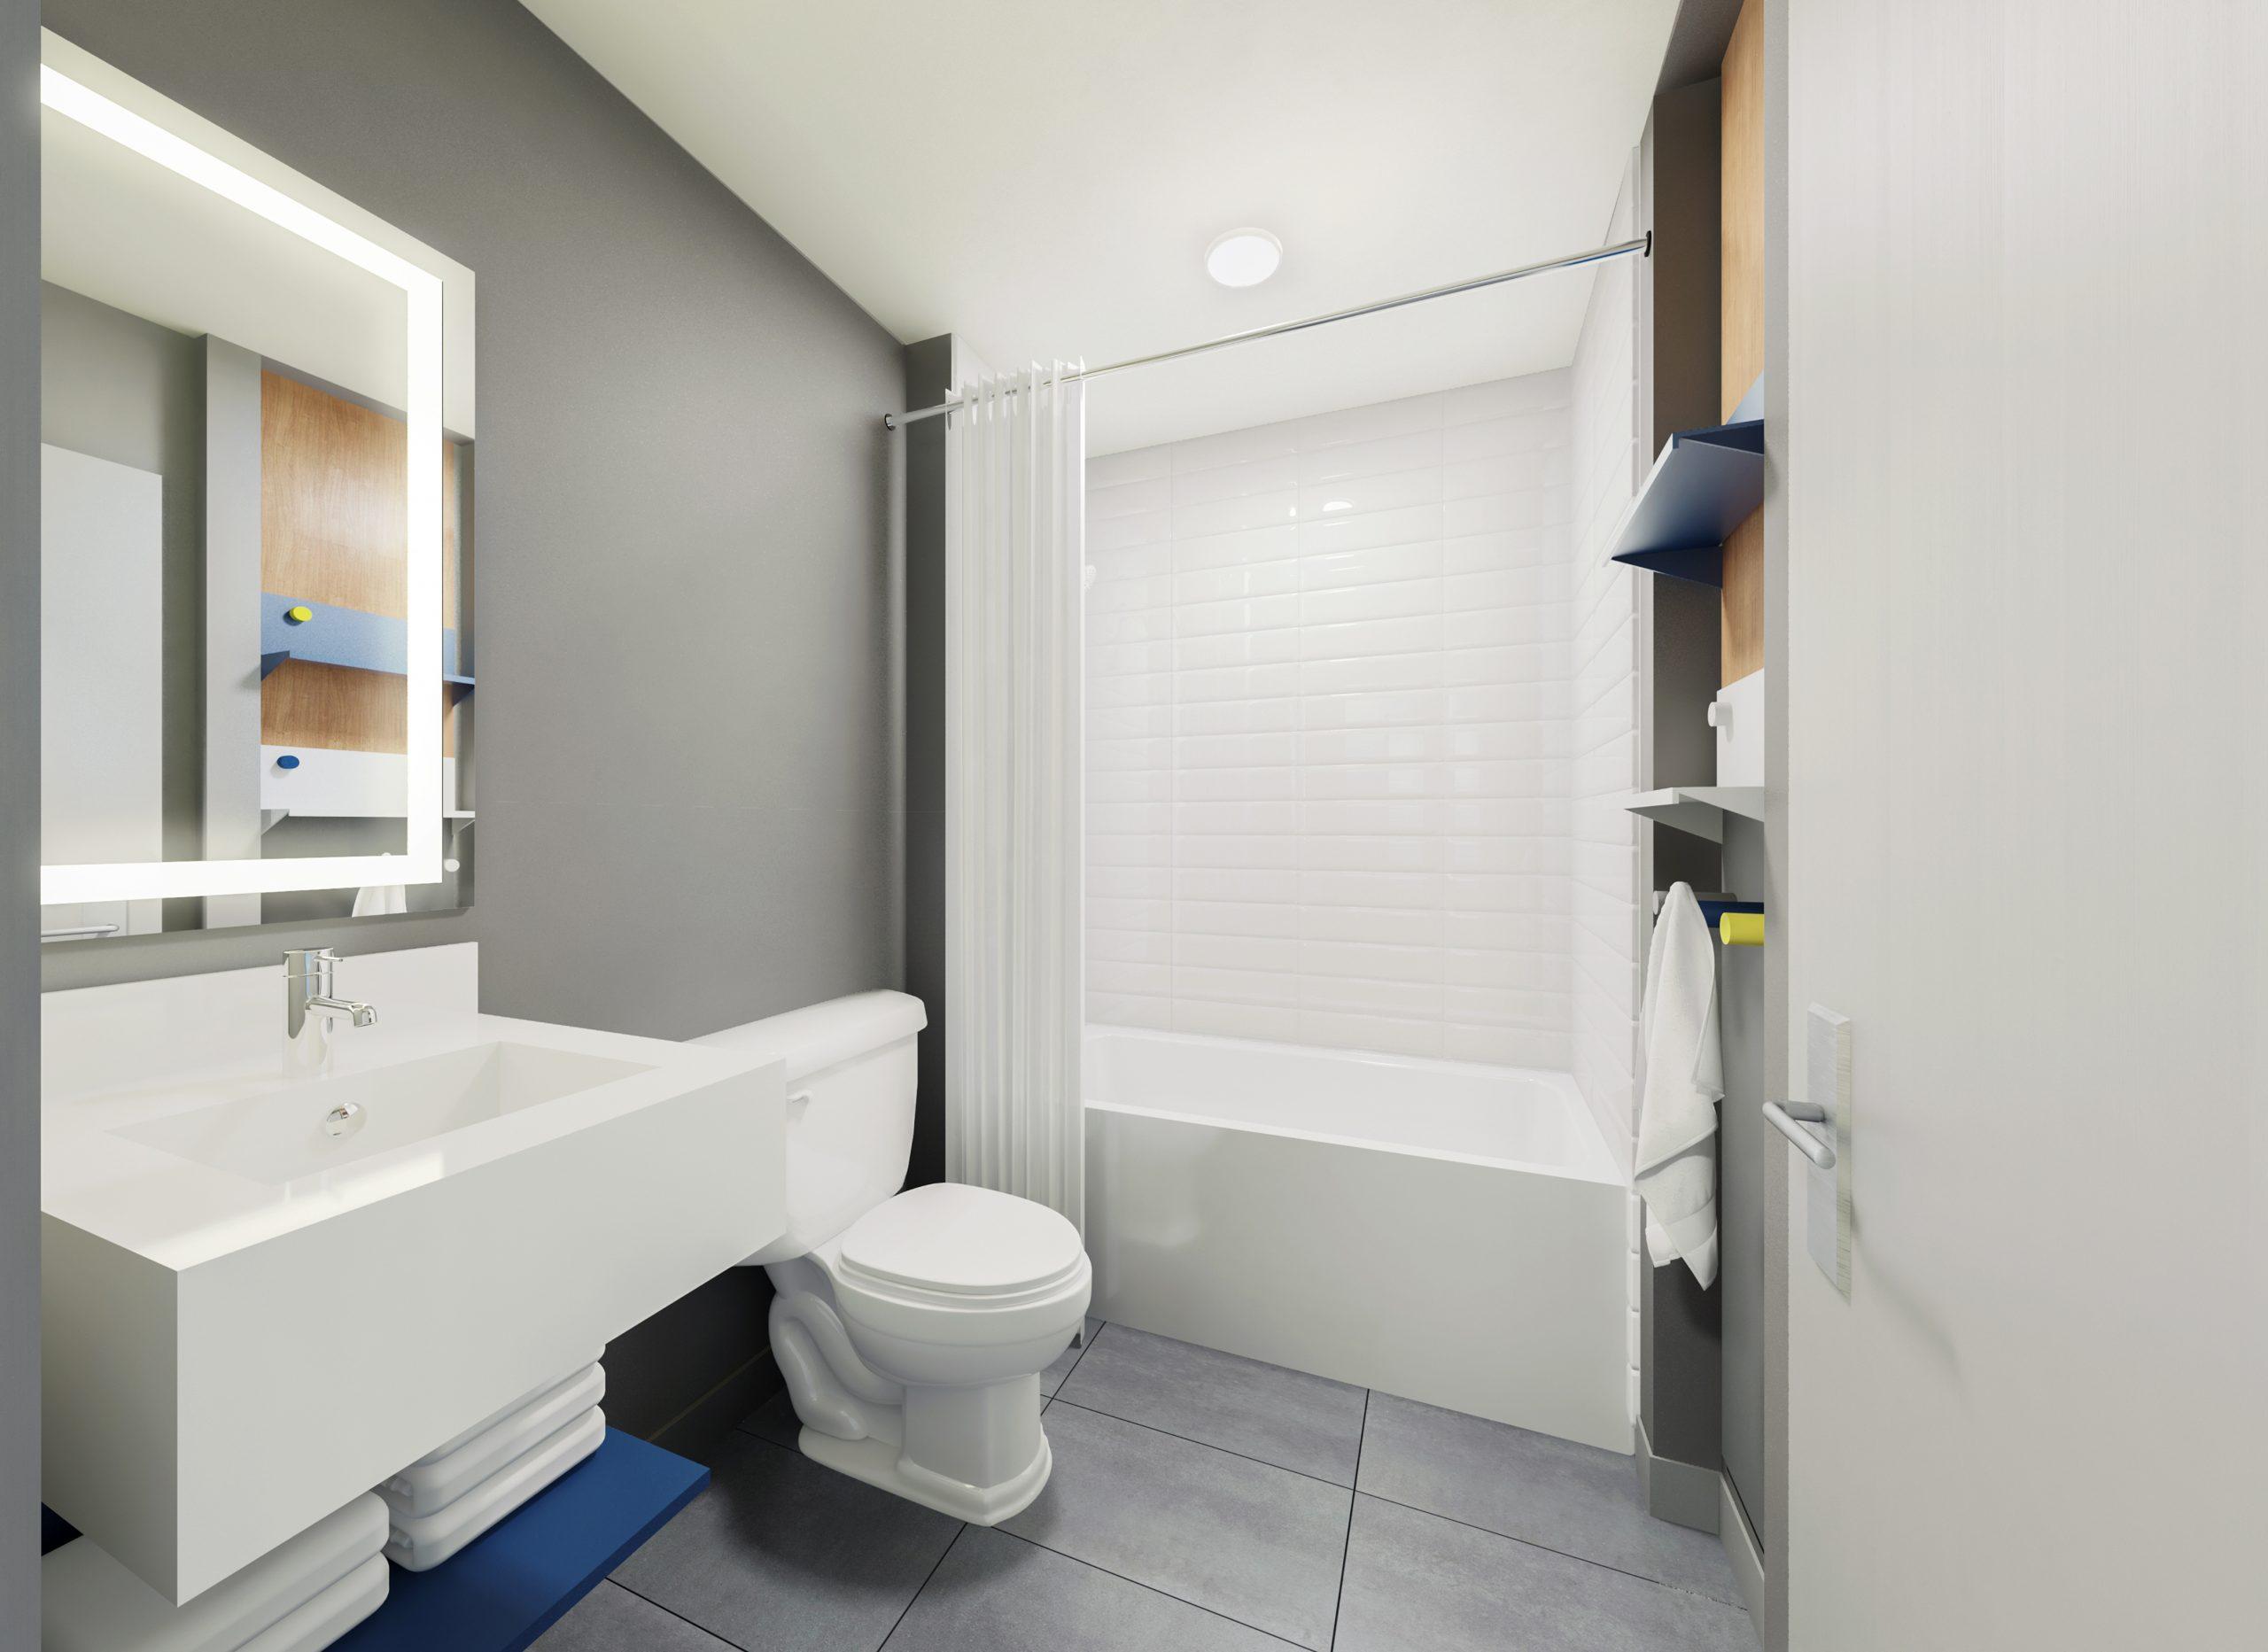 Microtel Moda Bathroom